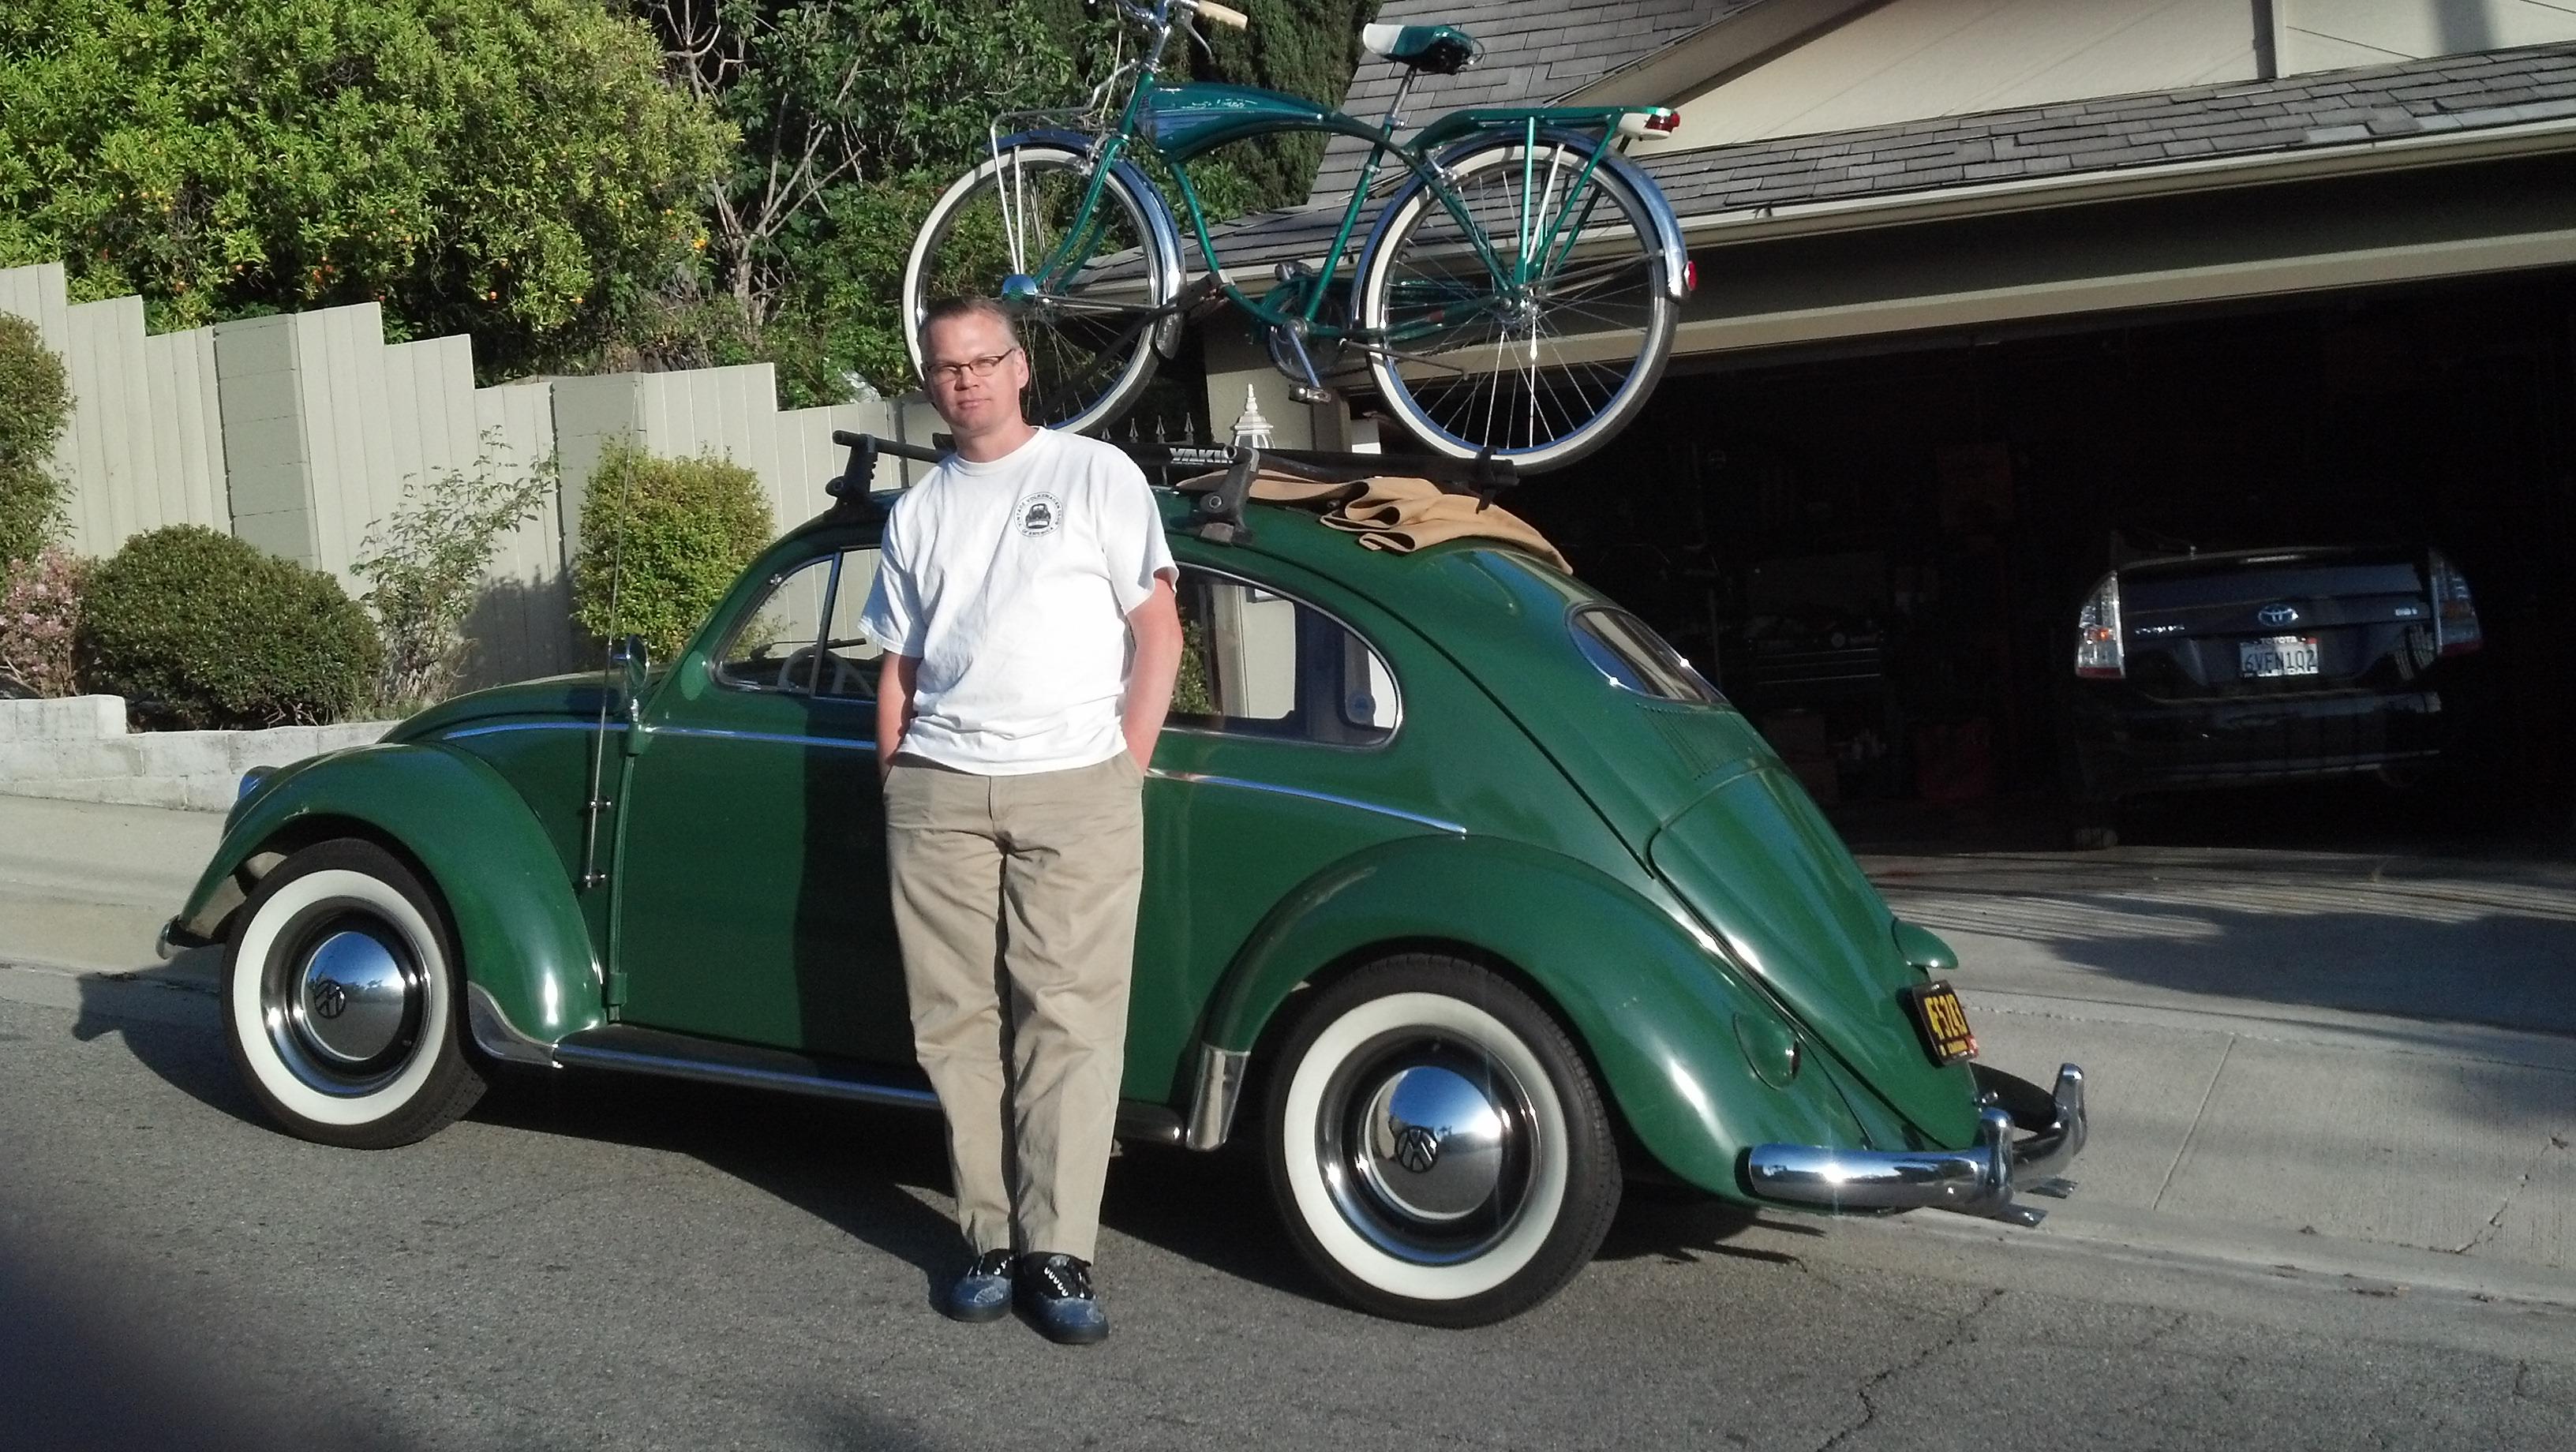 Your Cars: Sam Storey's 1954 VW Beetle Ragtop thumbnail